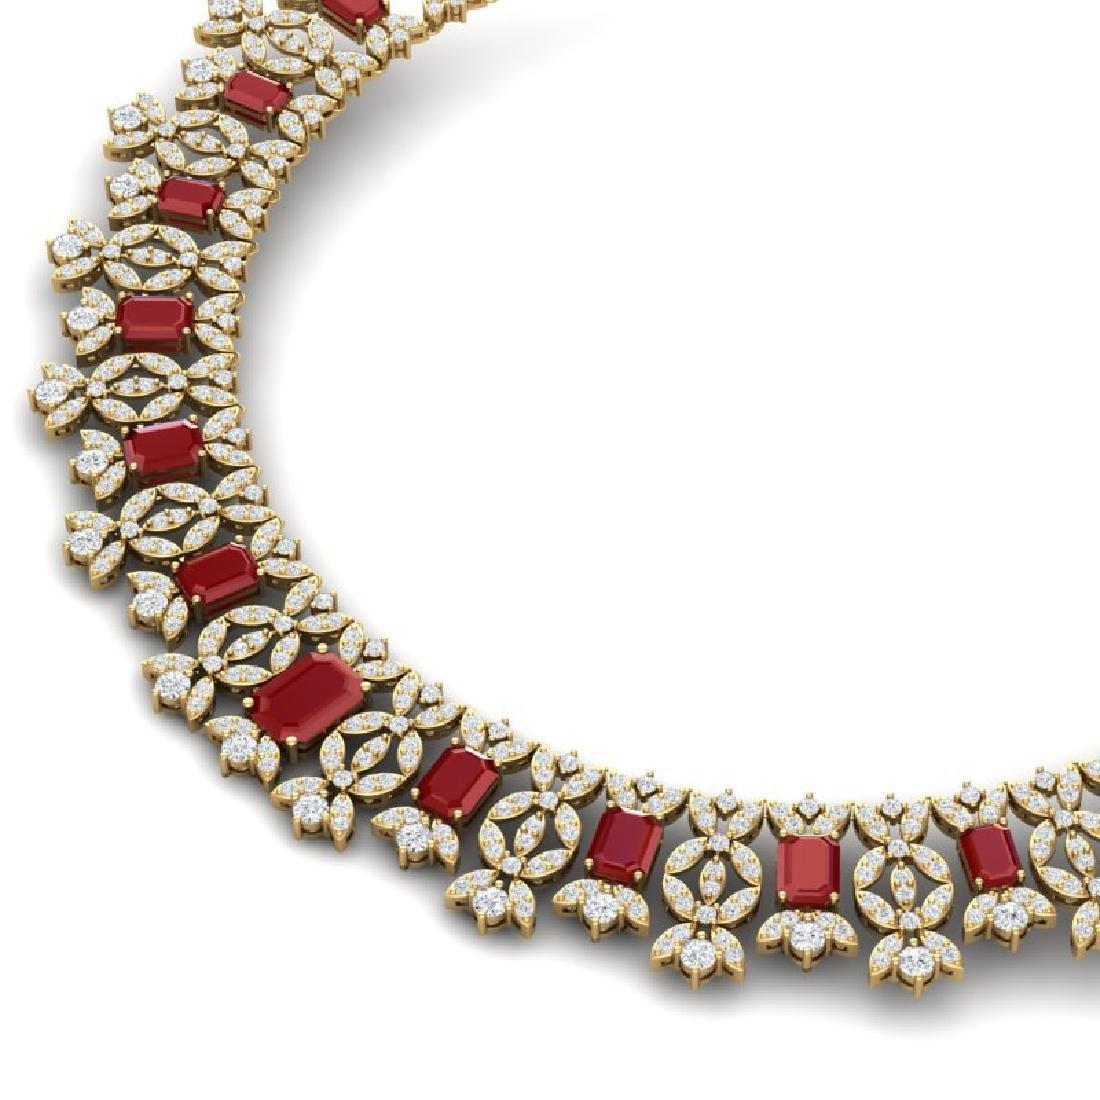 50.44 CTW Royalty Ruby & VS Diamond Necklace 18K Yellow